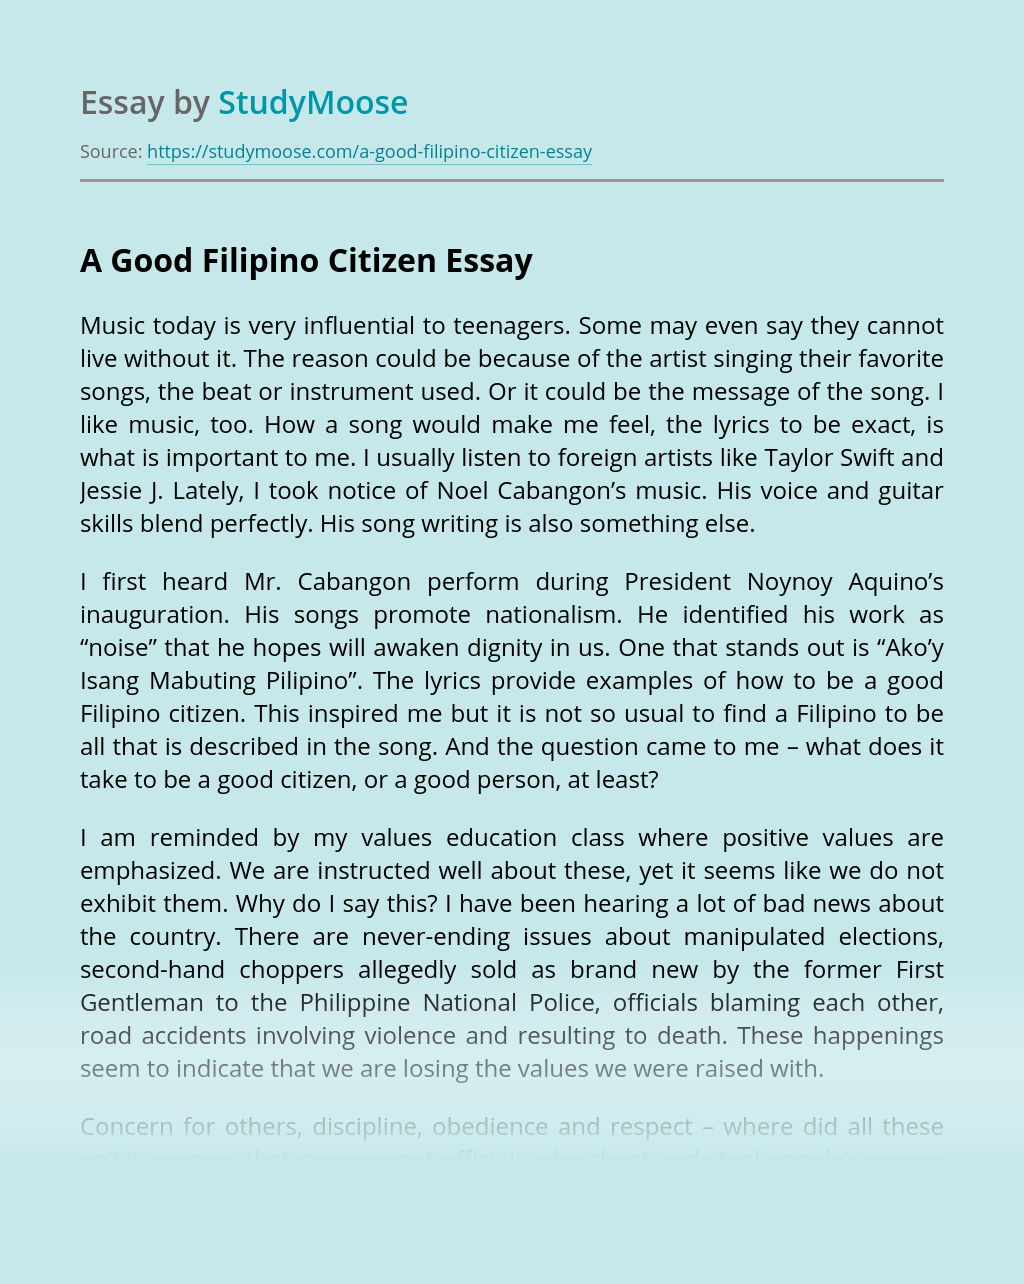 A Good Filipino Citizen